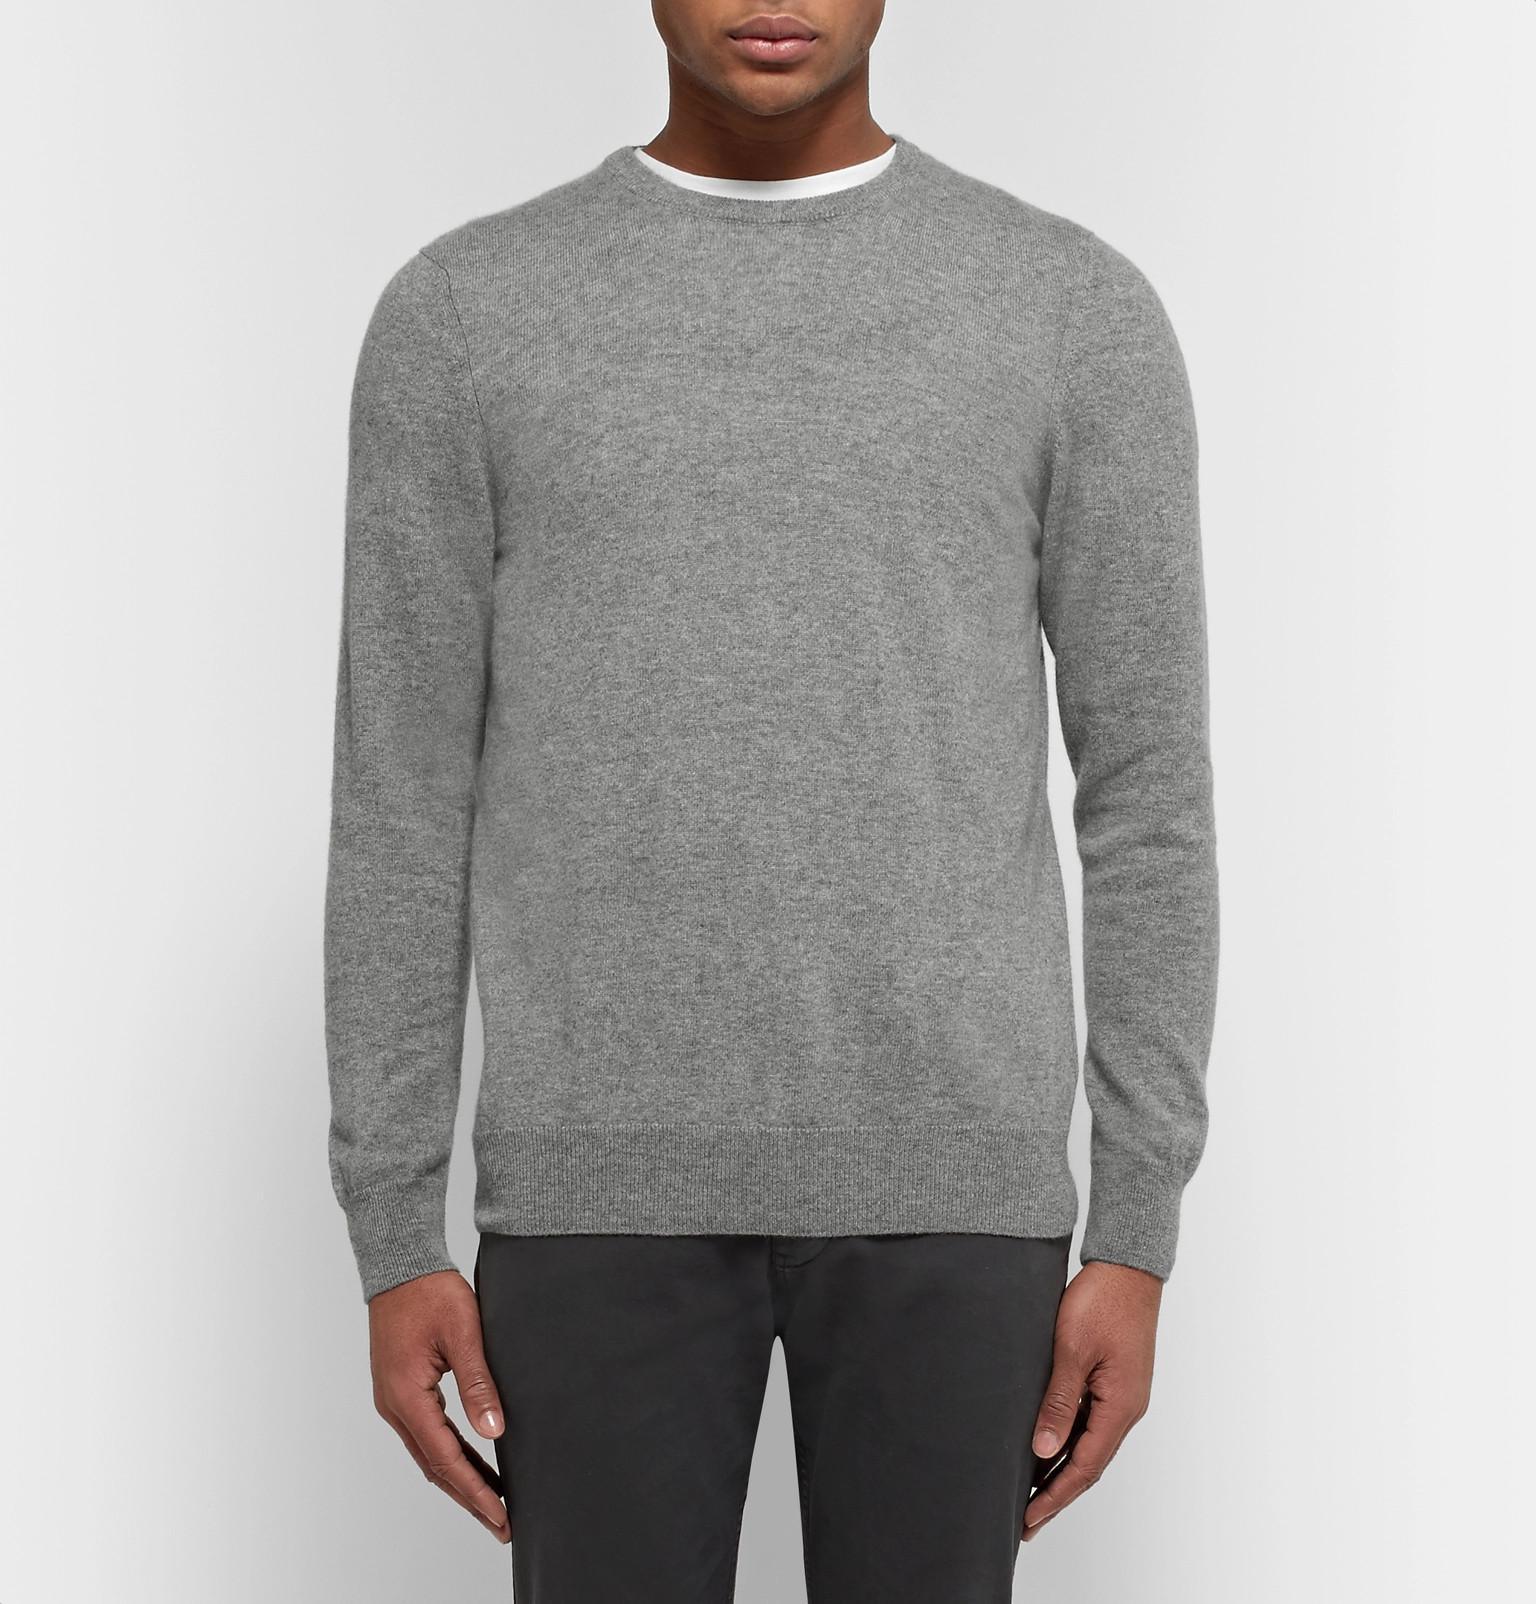 3d15c56a3180 Fullscreen Nn07 For Gray Lyst Sweater View Cashmere Men Charles 8qPwn8fZ